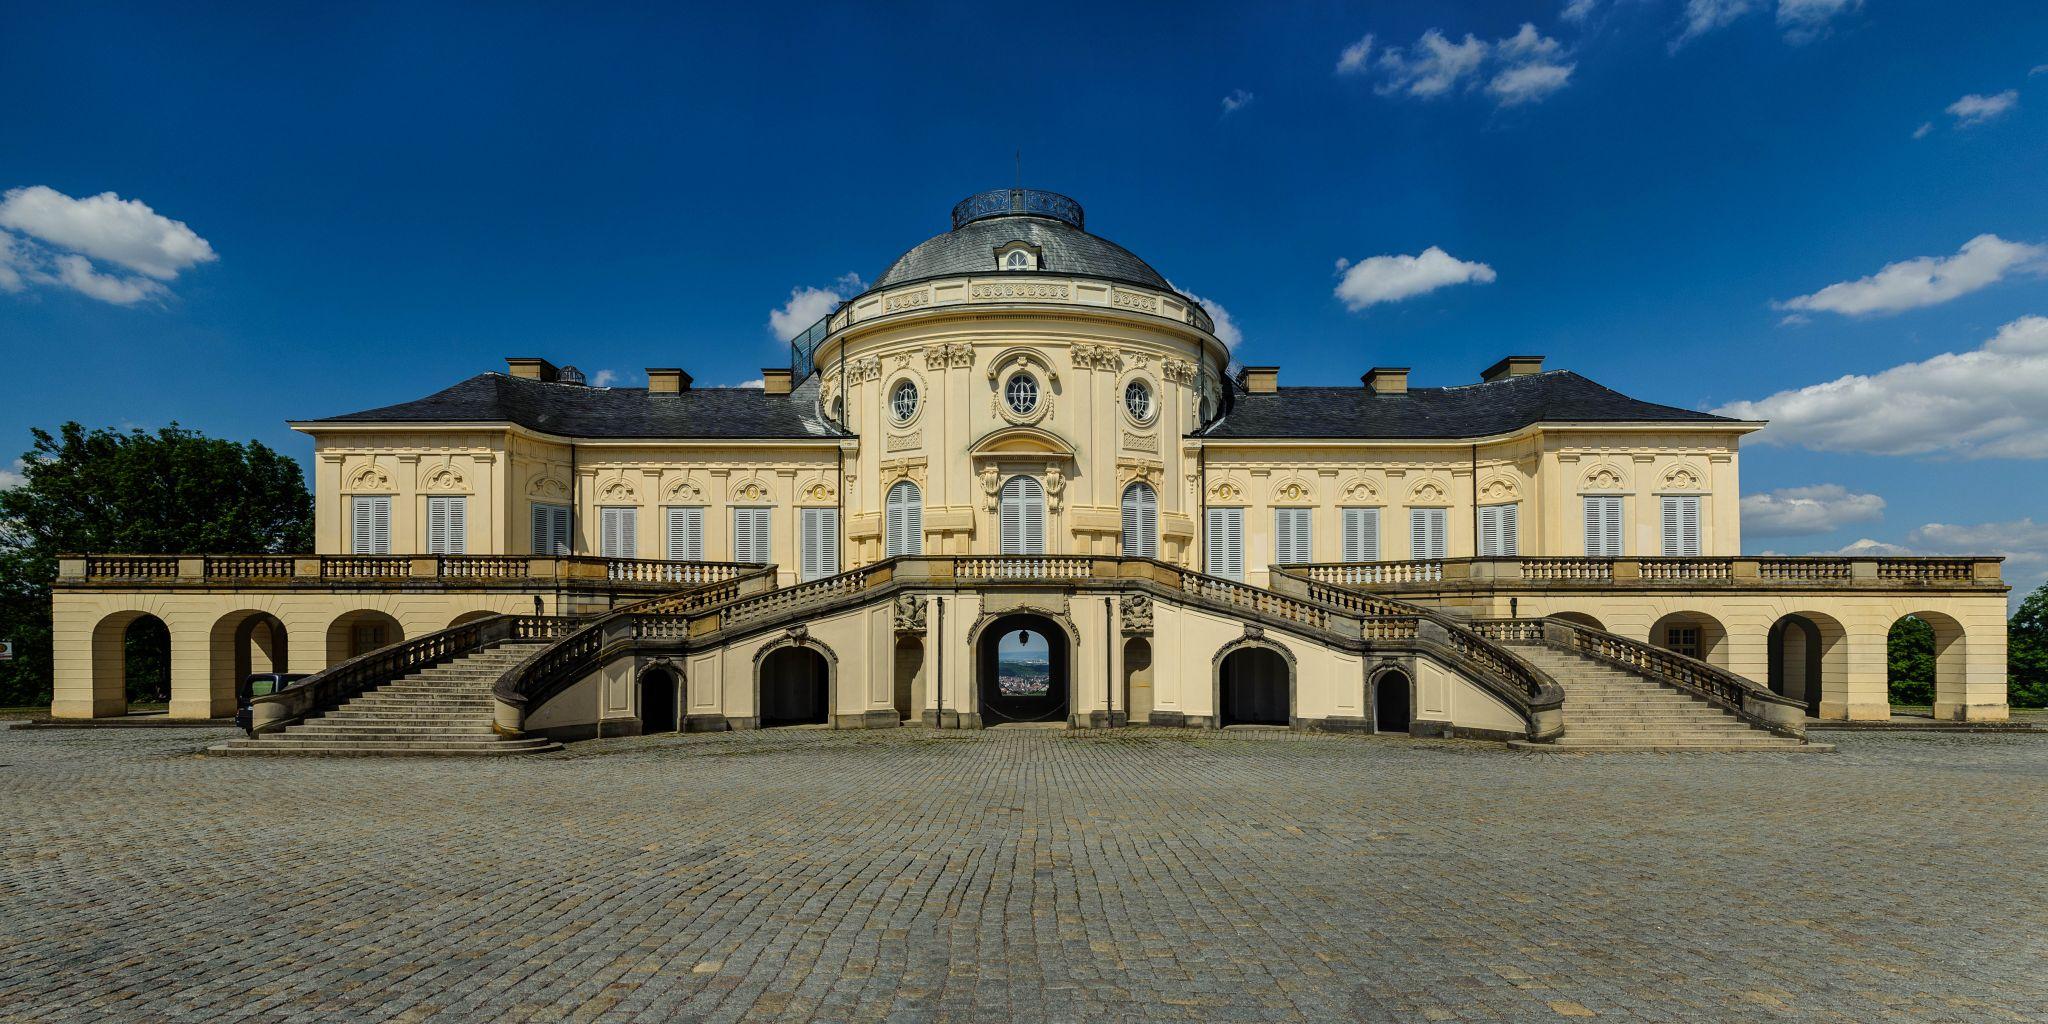 Schloss Solitude, Germany